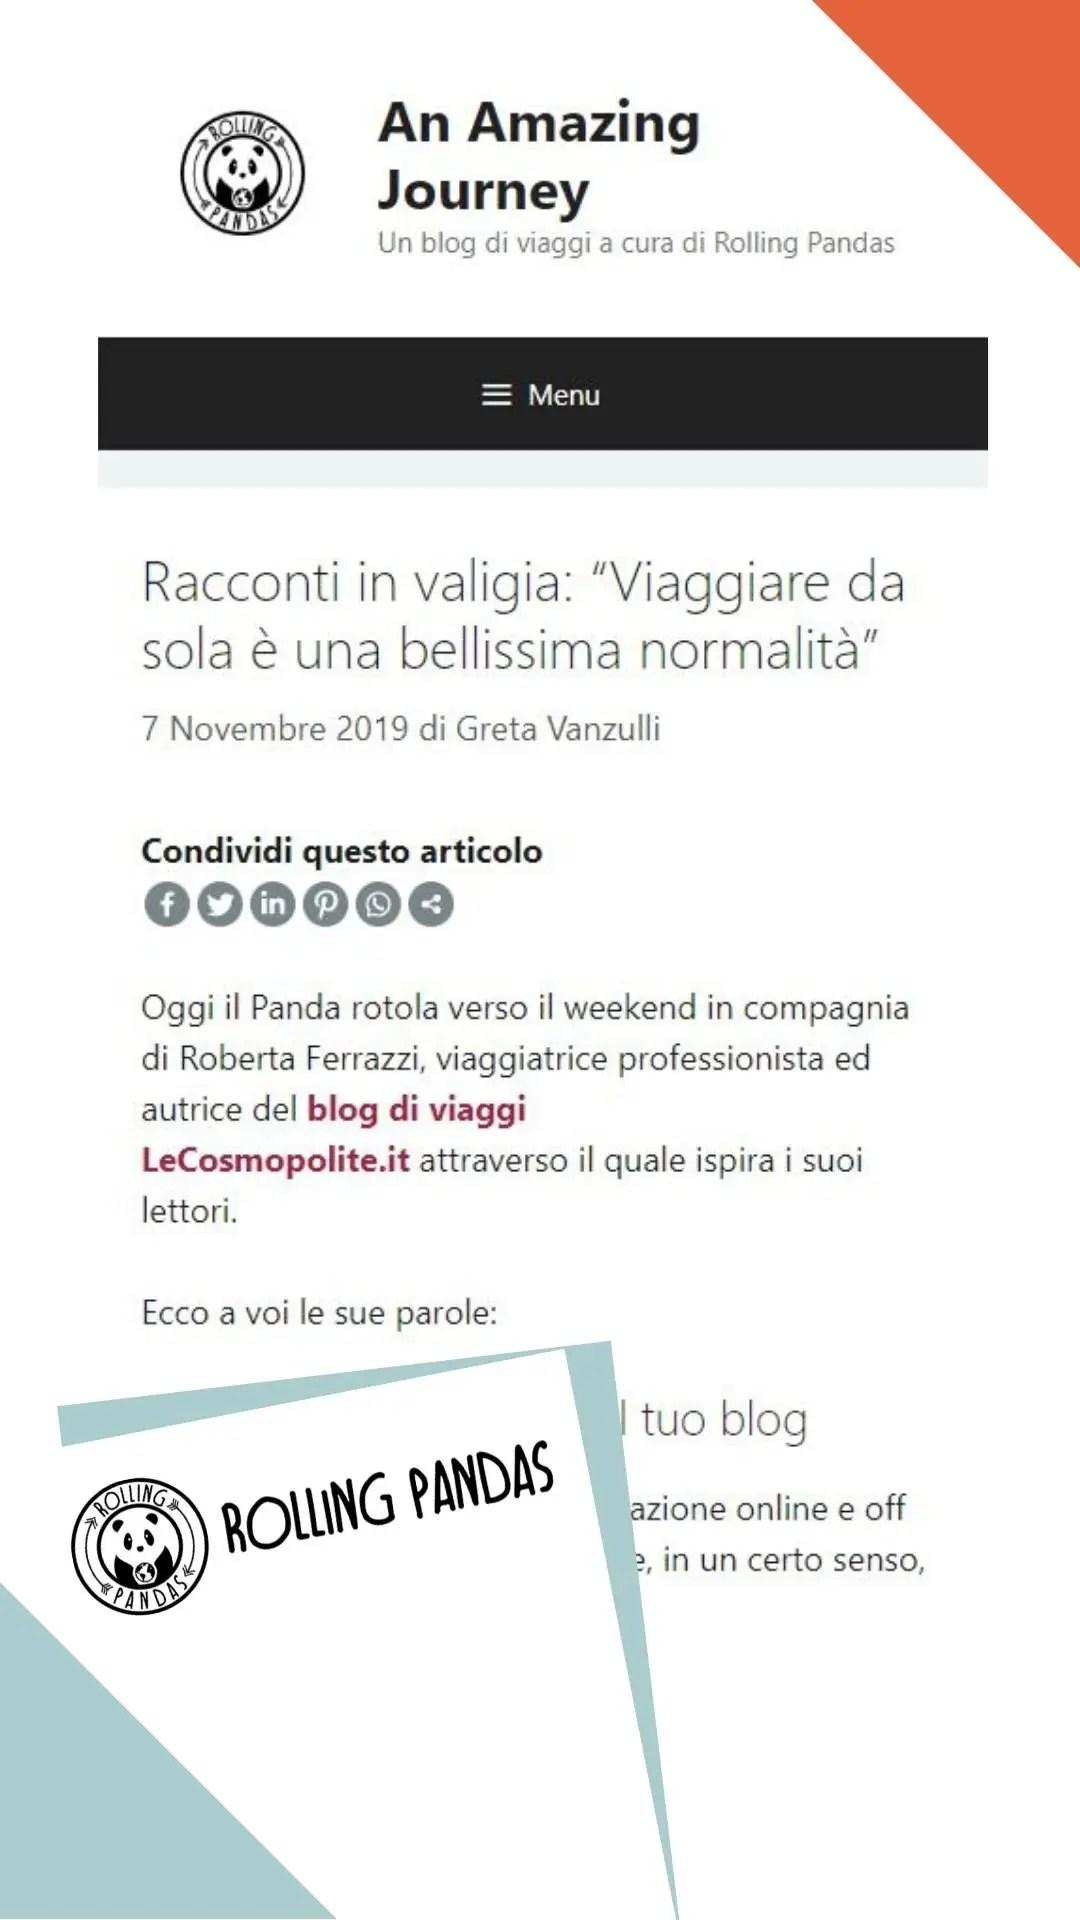 Intervista Roberta Ferrazzi pubblicata in RollingPanda